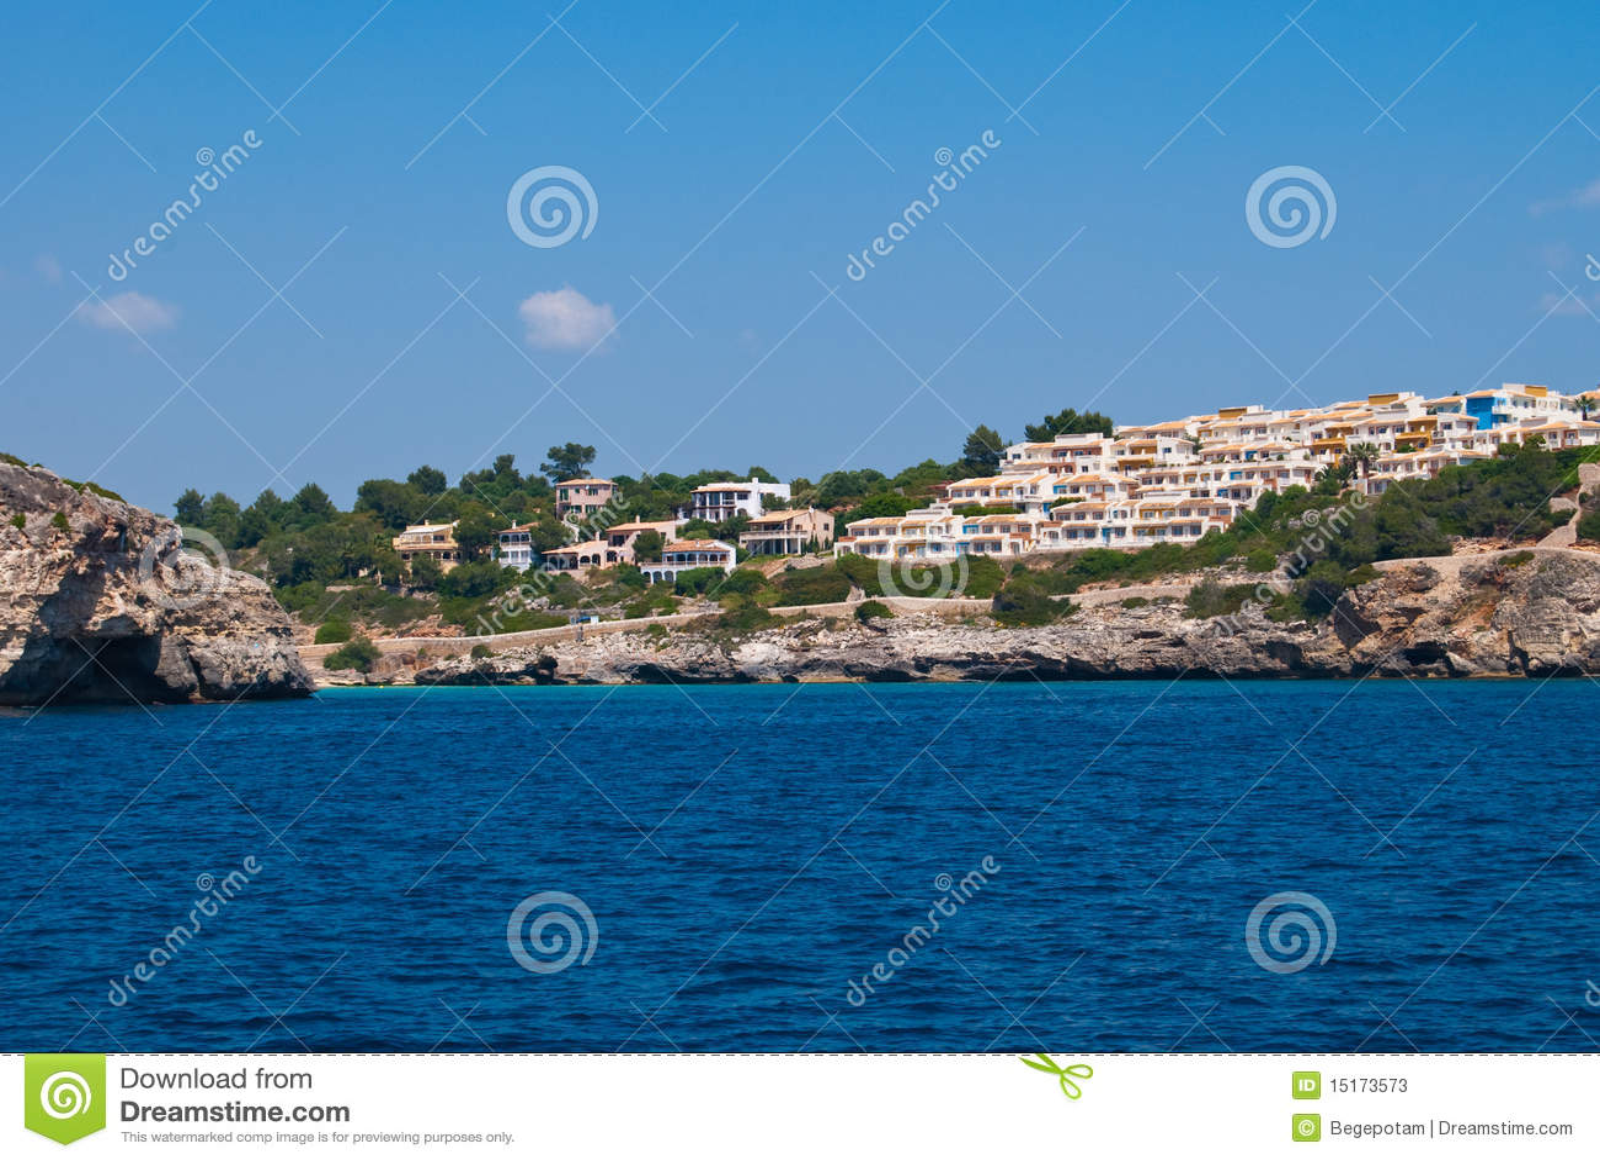 Cala Romantica Spain  city images : Cala Romantica bay view from the open sea, Majorca island, Spain.